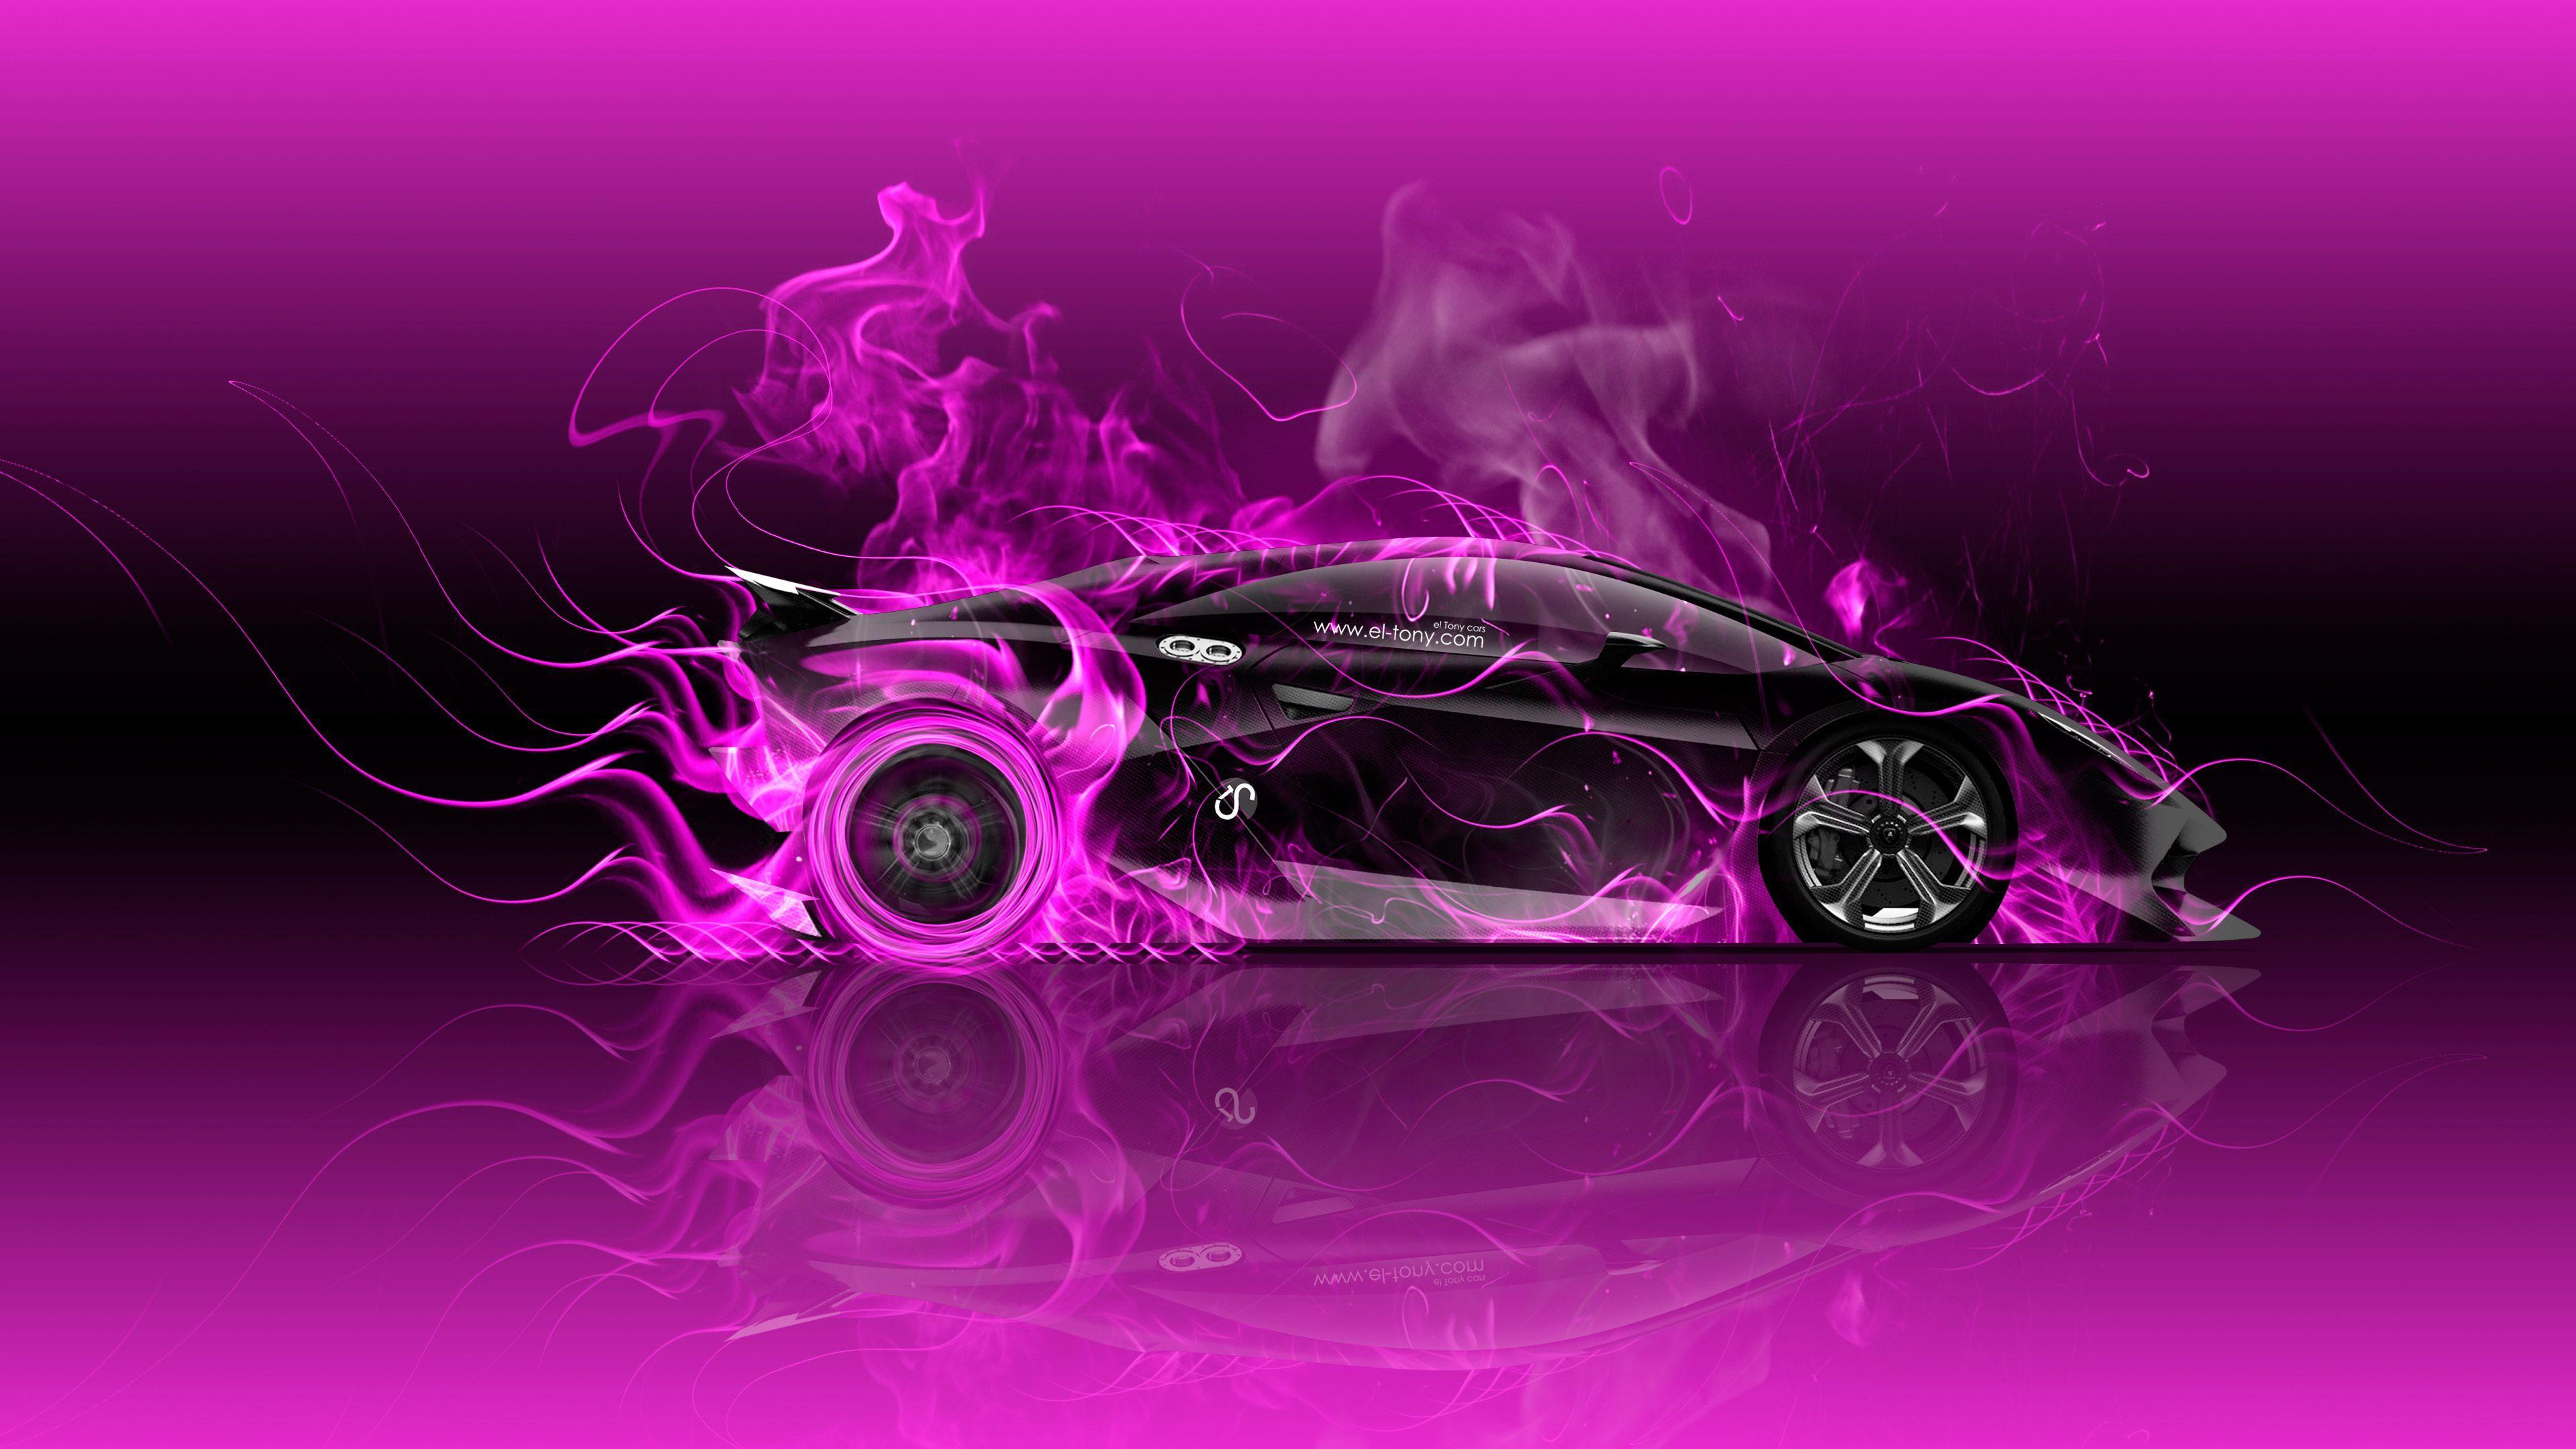 Purple Fire Wallpapers - Wallpaper Cave